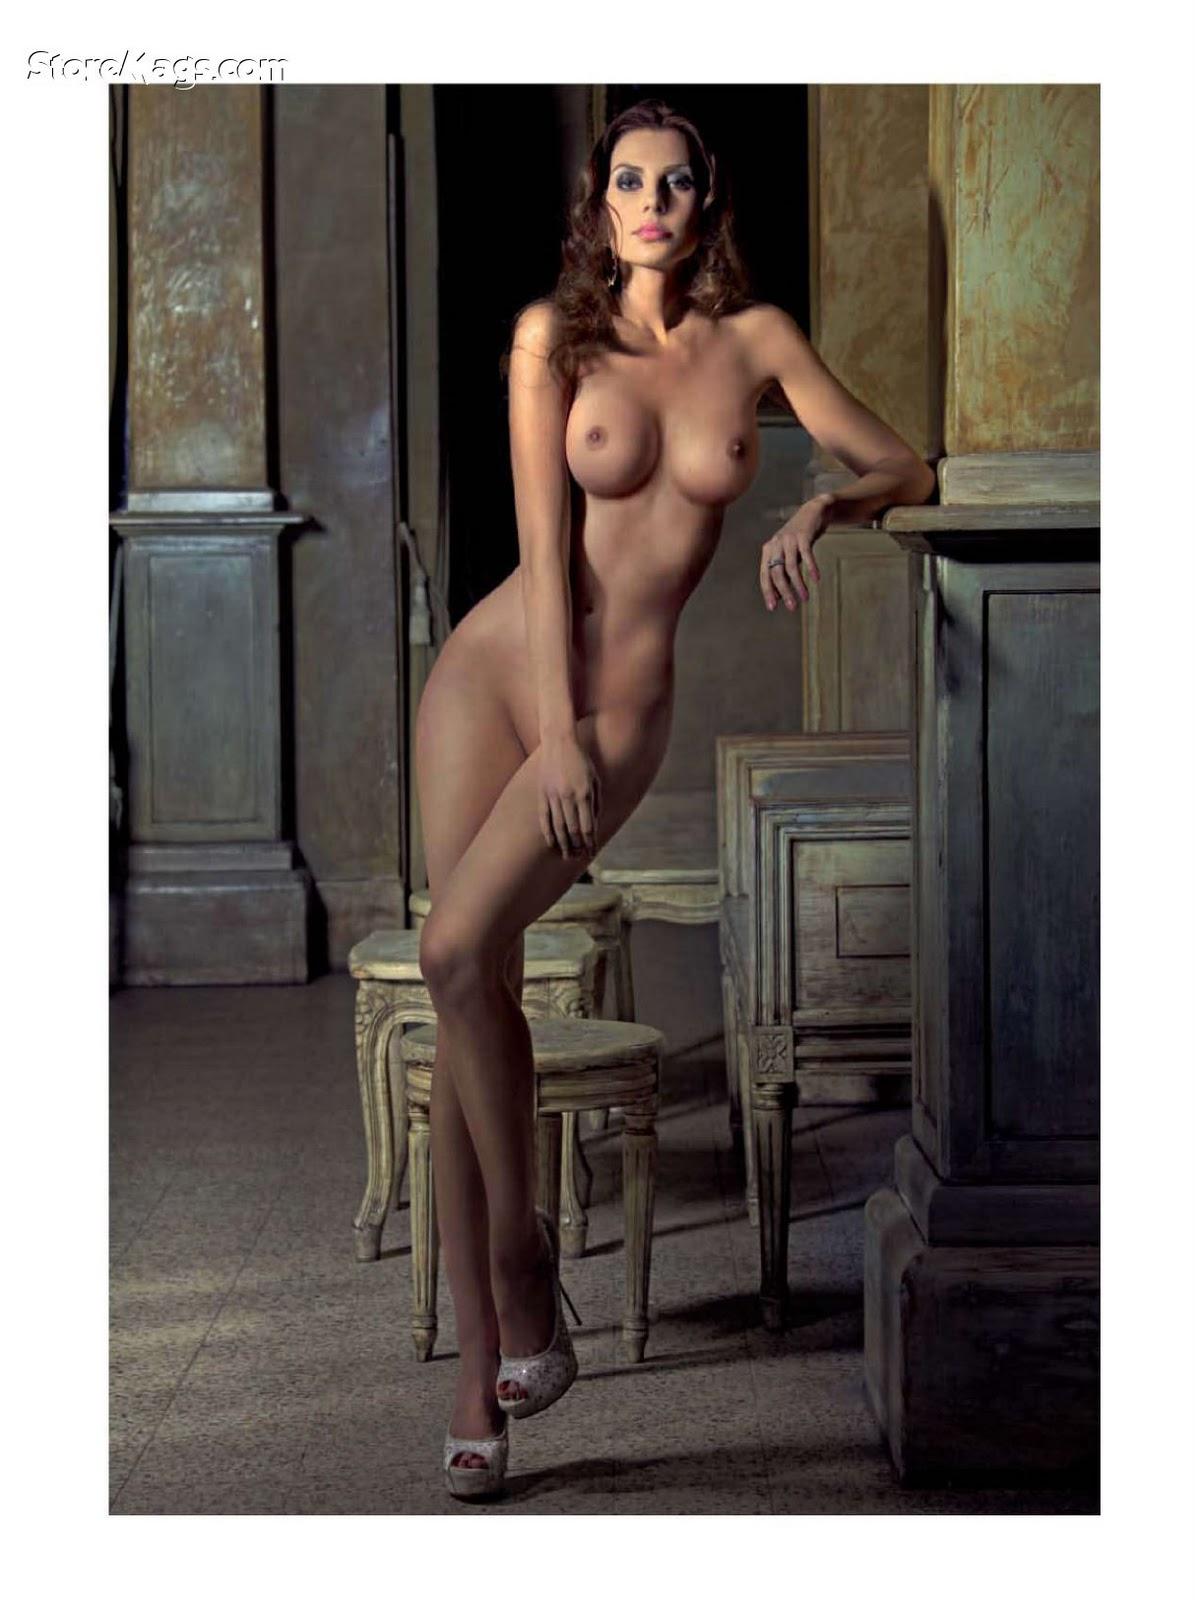 http://4.bp.blogspot.com/-dG-1QMwoW0E/TZclKdY-deI/AAAAAAAAAGA/DcWPuSh6HDg/s1600/download_php_ID_126160639%2526salt_198da6%2526sec_5d7f7e%2526filesize_197526%2526filename_Playboy_4-2011_Italy_Scanof_net_095.jpg